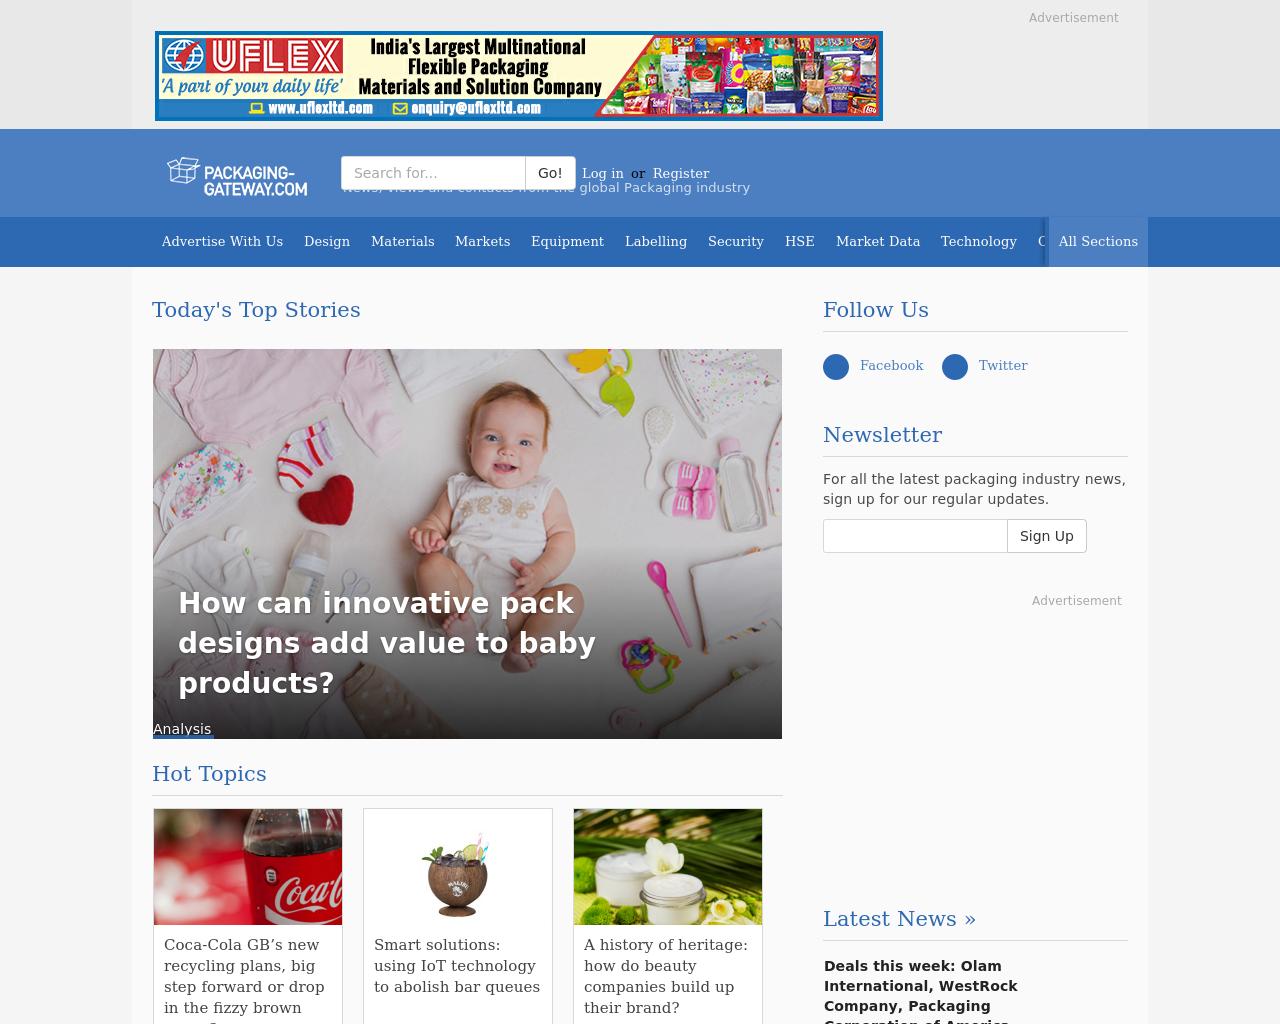 Packaging-Gateway-Advertising-Reviews-Pricing